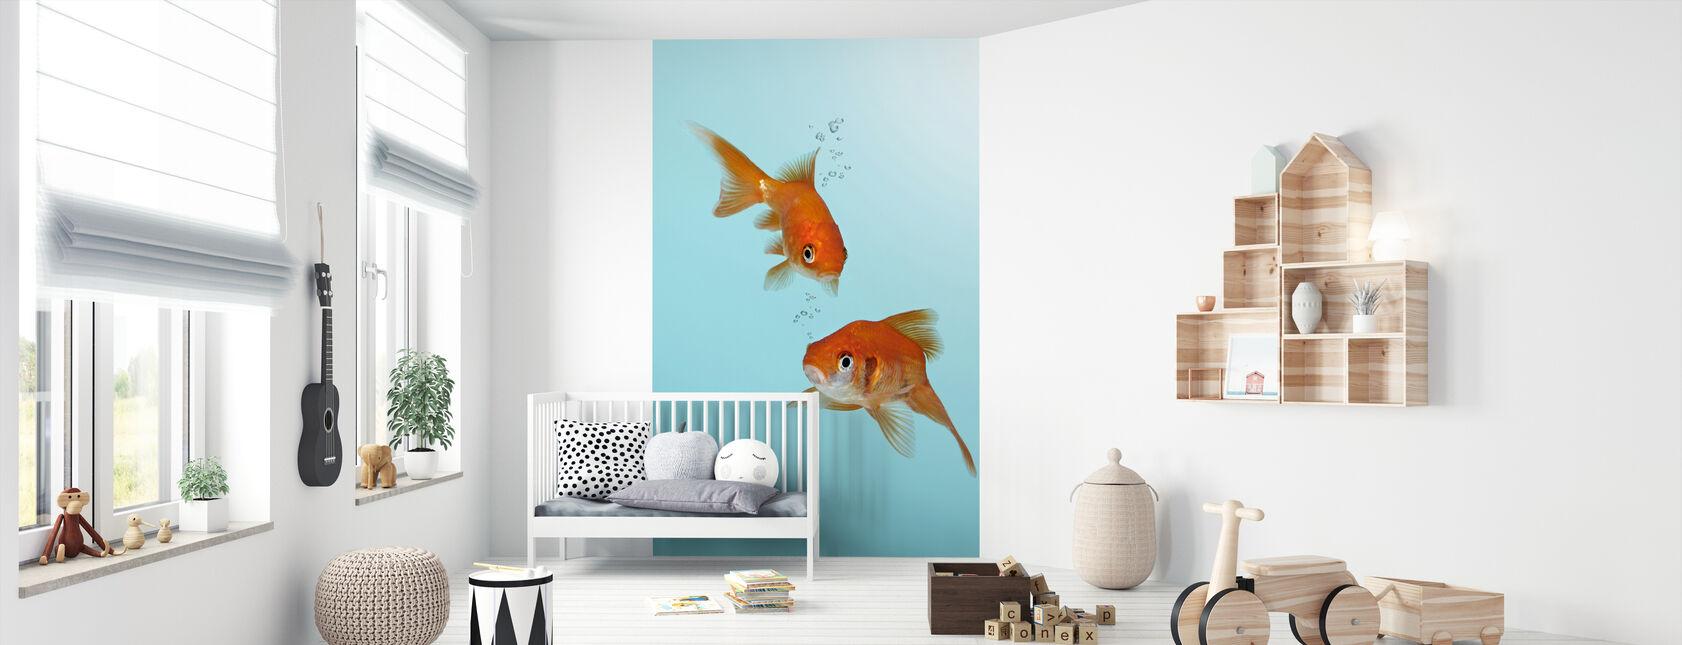 A Pair of Goldfish - Wallpaper - Nursery